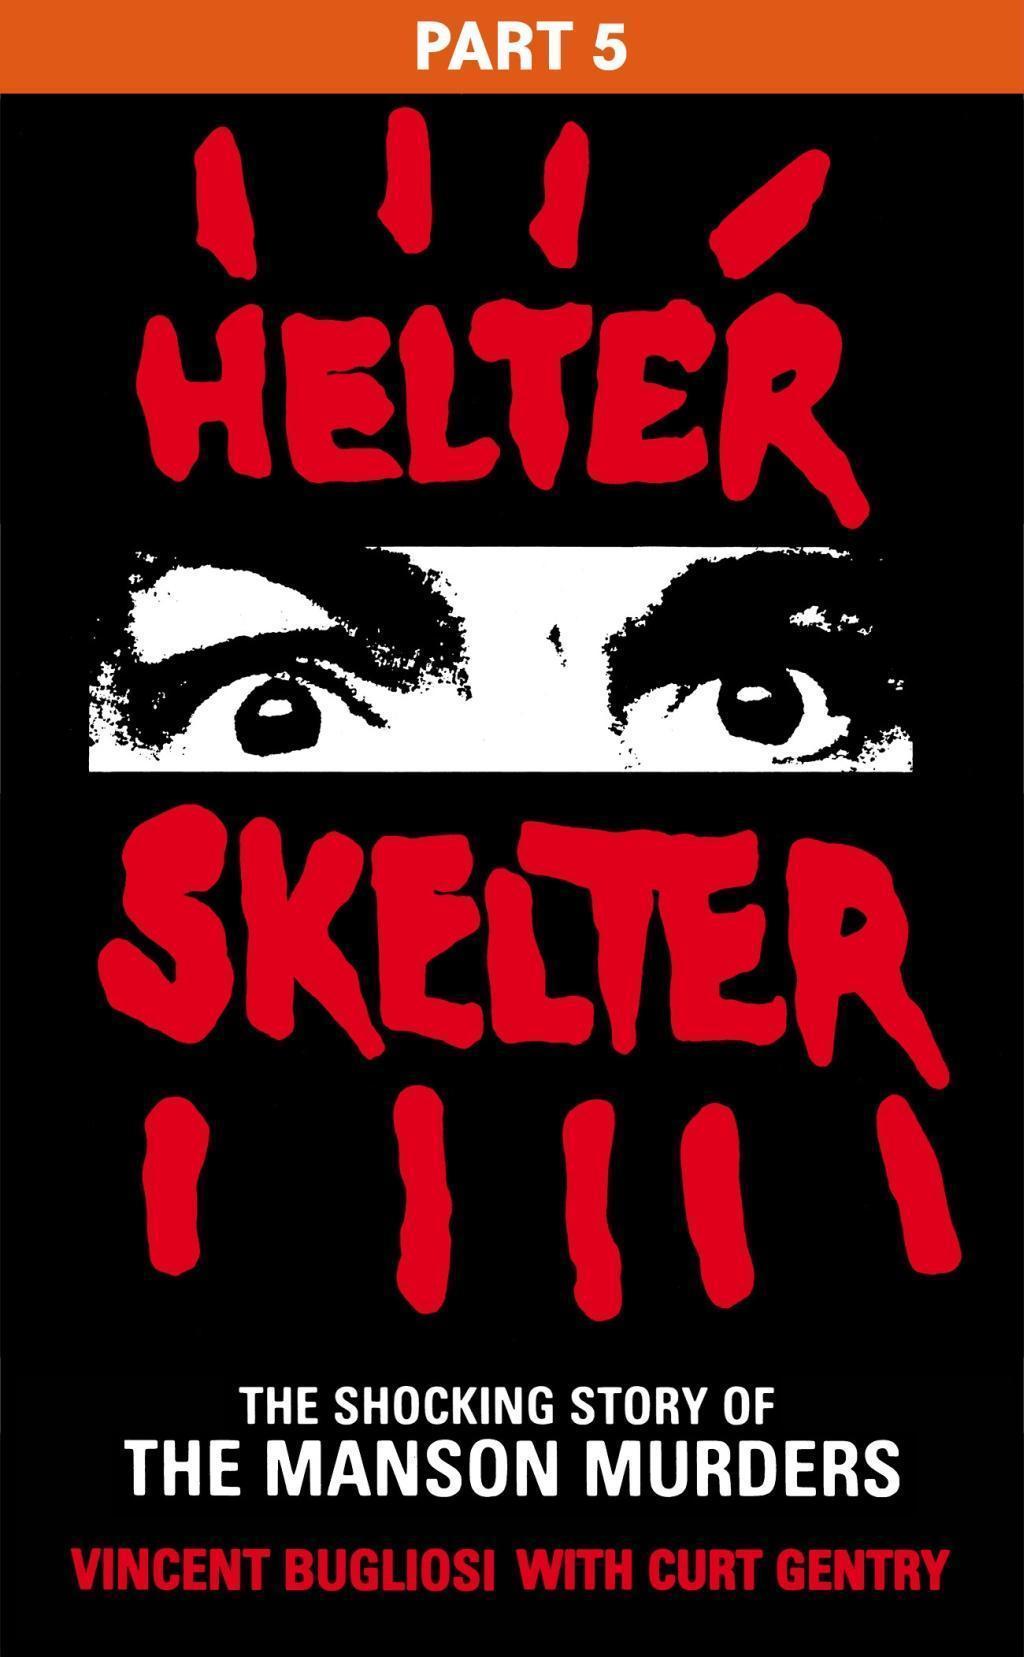 Helter Skelter: Part Five of the Shocking Manson Murders